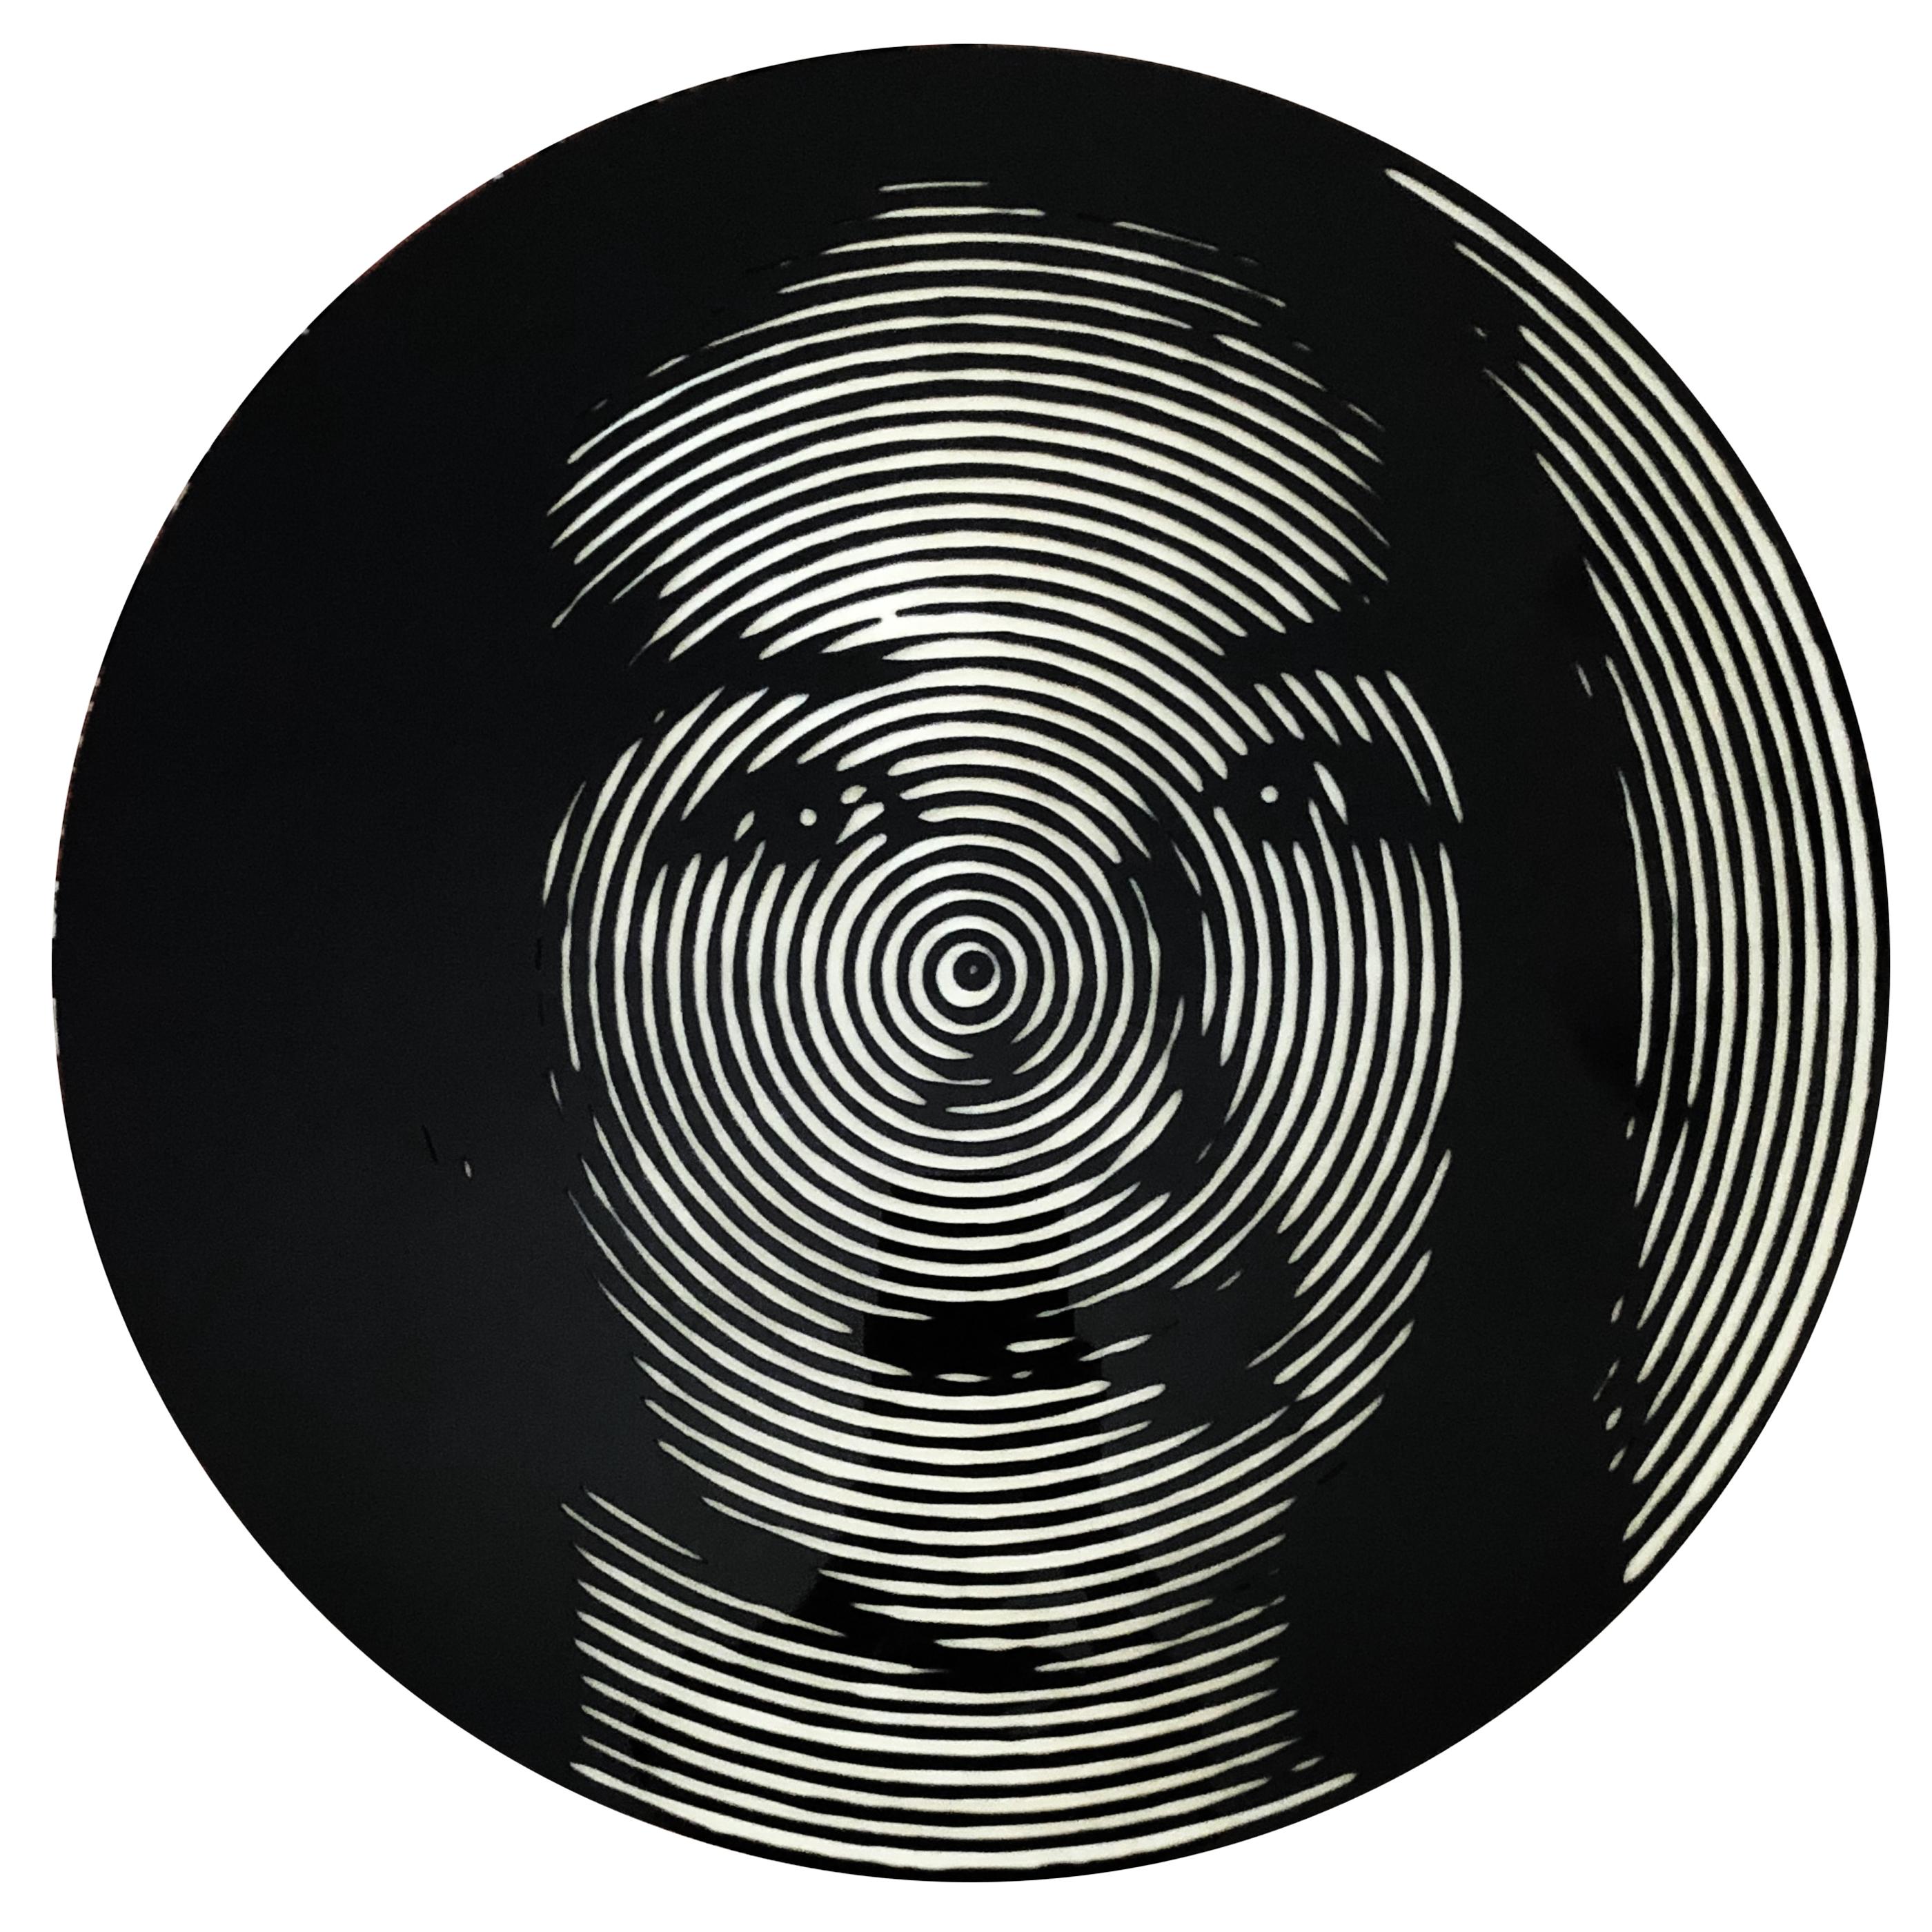 Nelson Gutierrez, Gloria Estela Lizarazo, 2019, 24 inches in diameter, Plexiglass and MDF